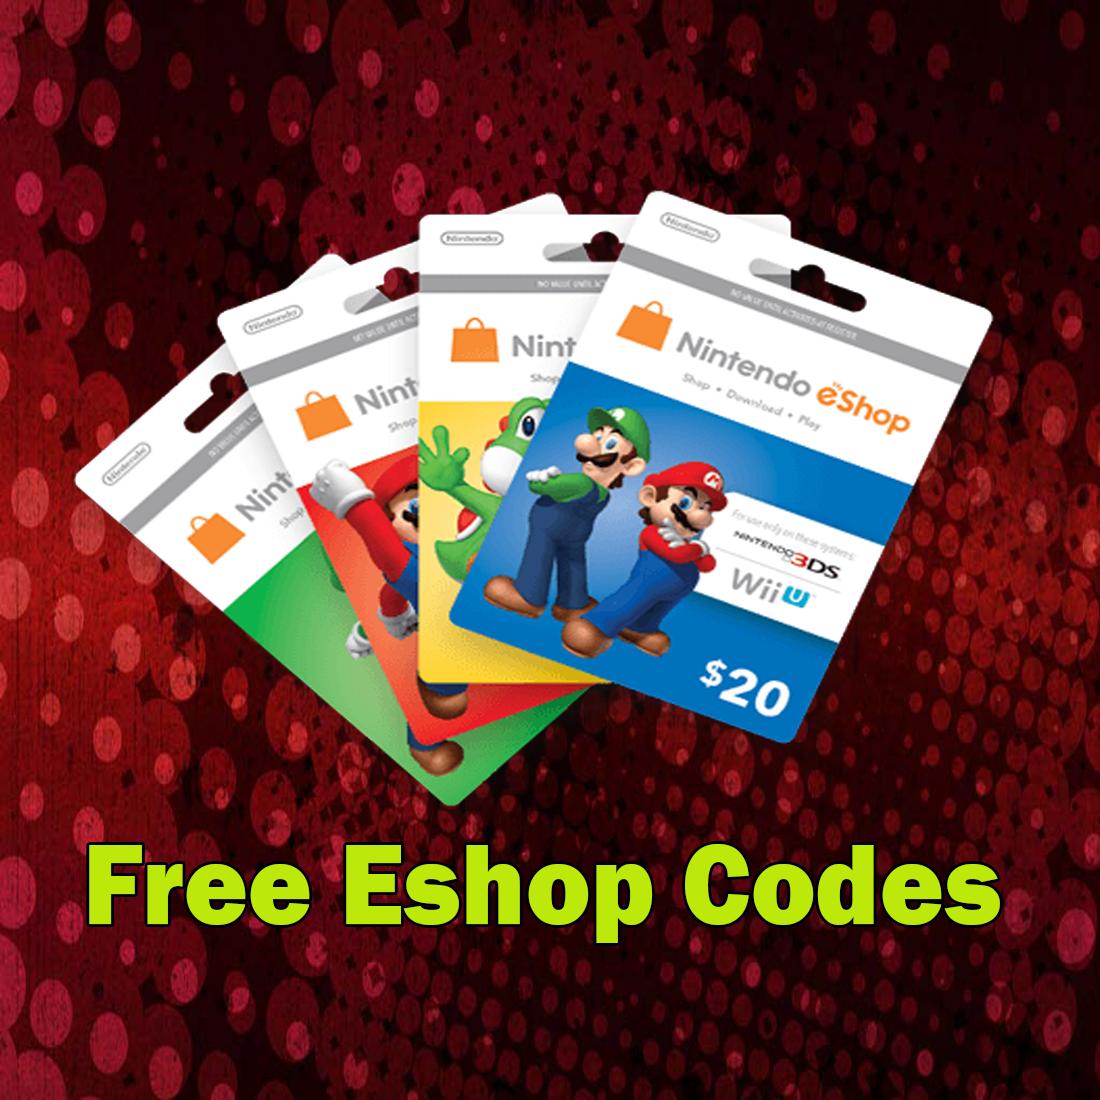 Free Nintendo Eshop Codes Generator - Nintendo Switch 3DS